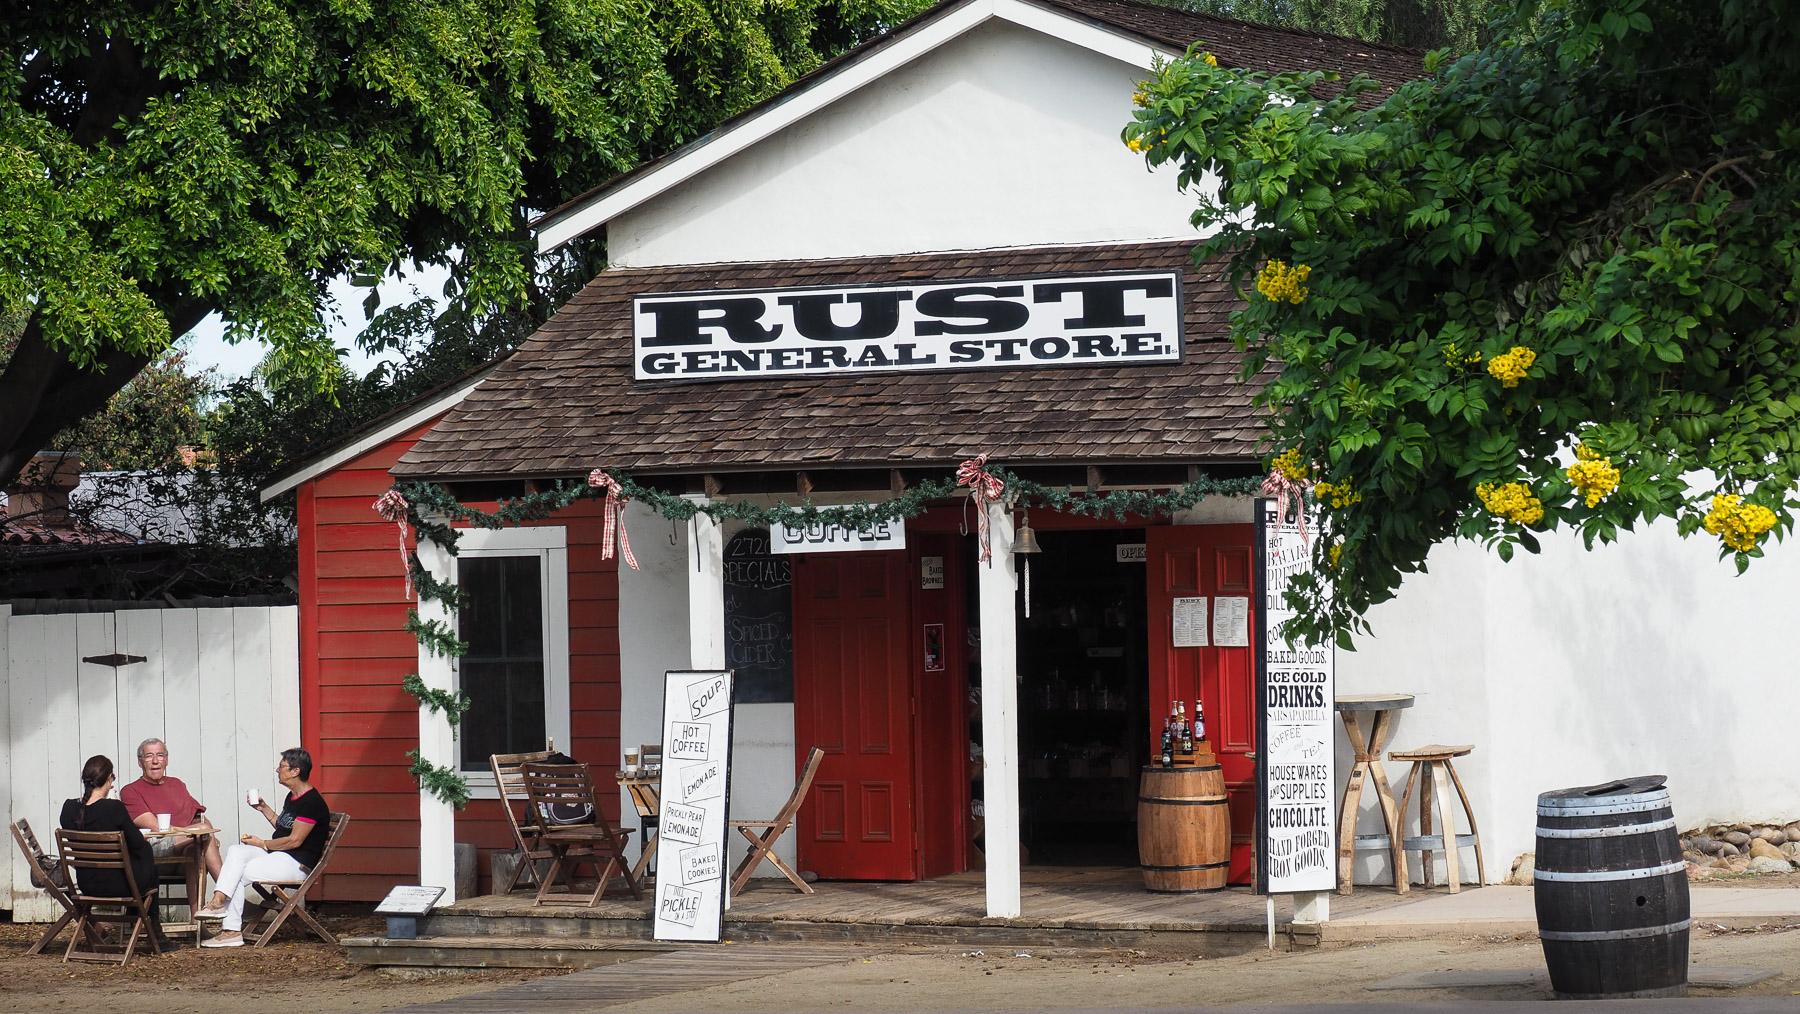 Historischer General Store